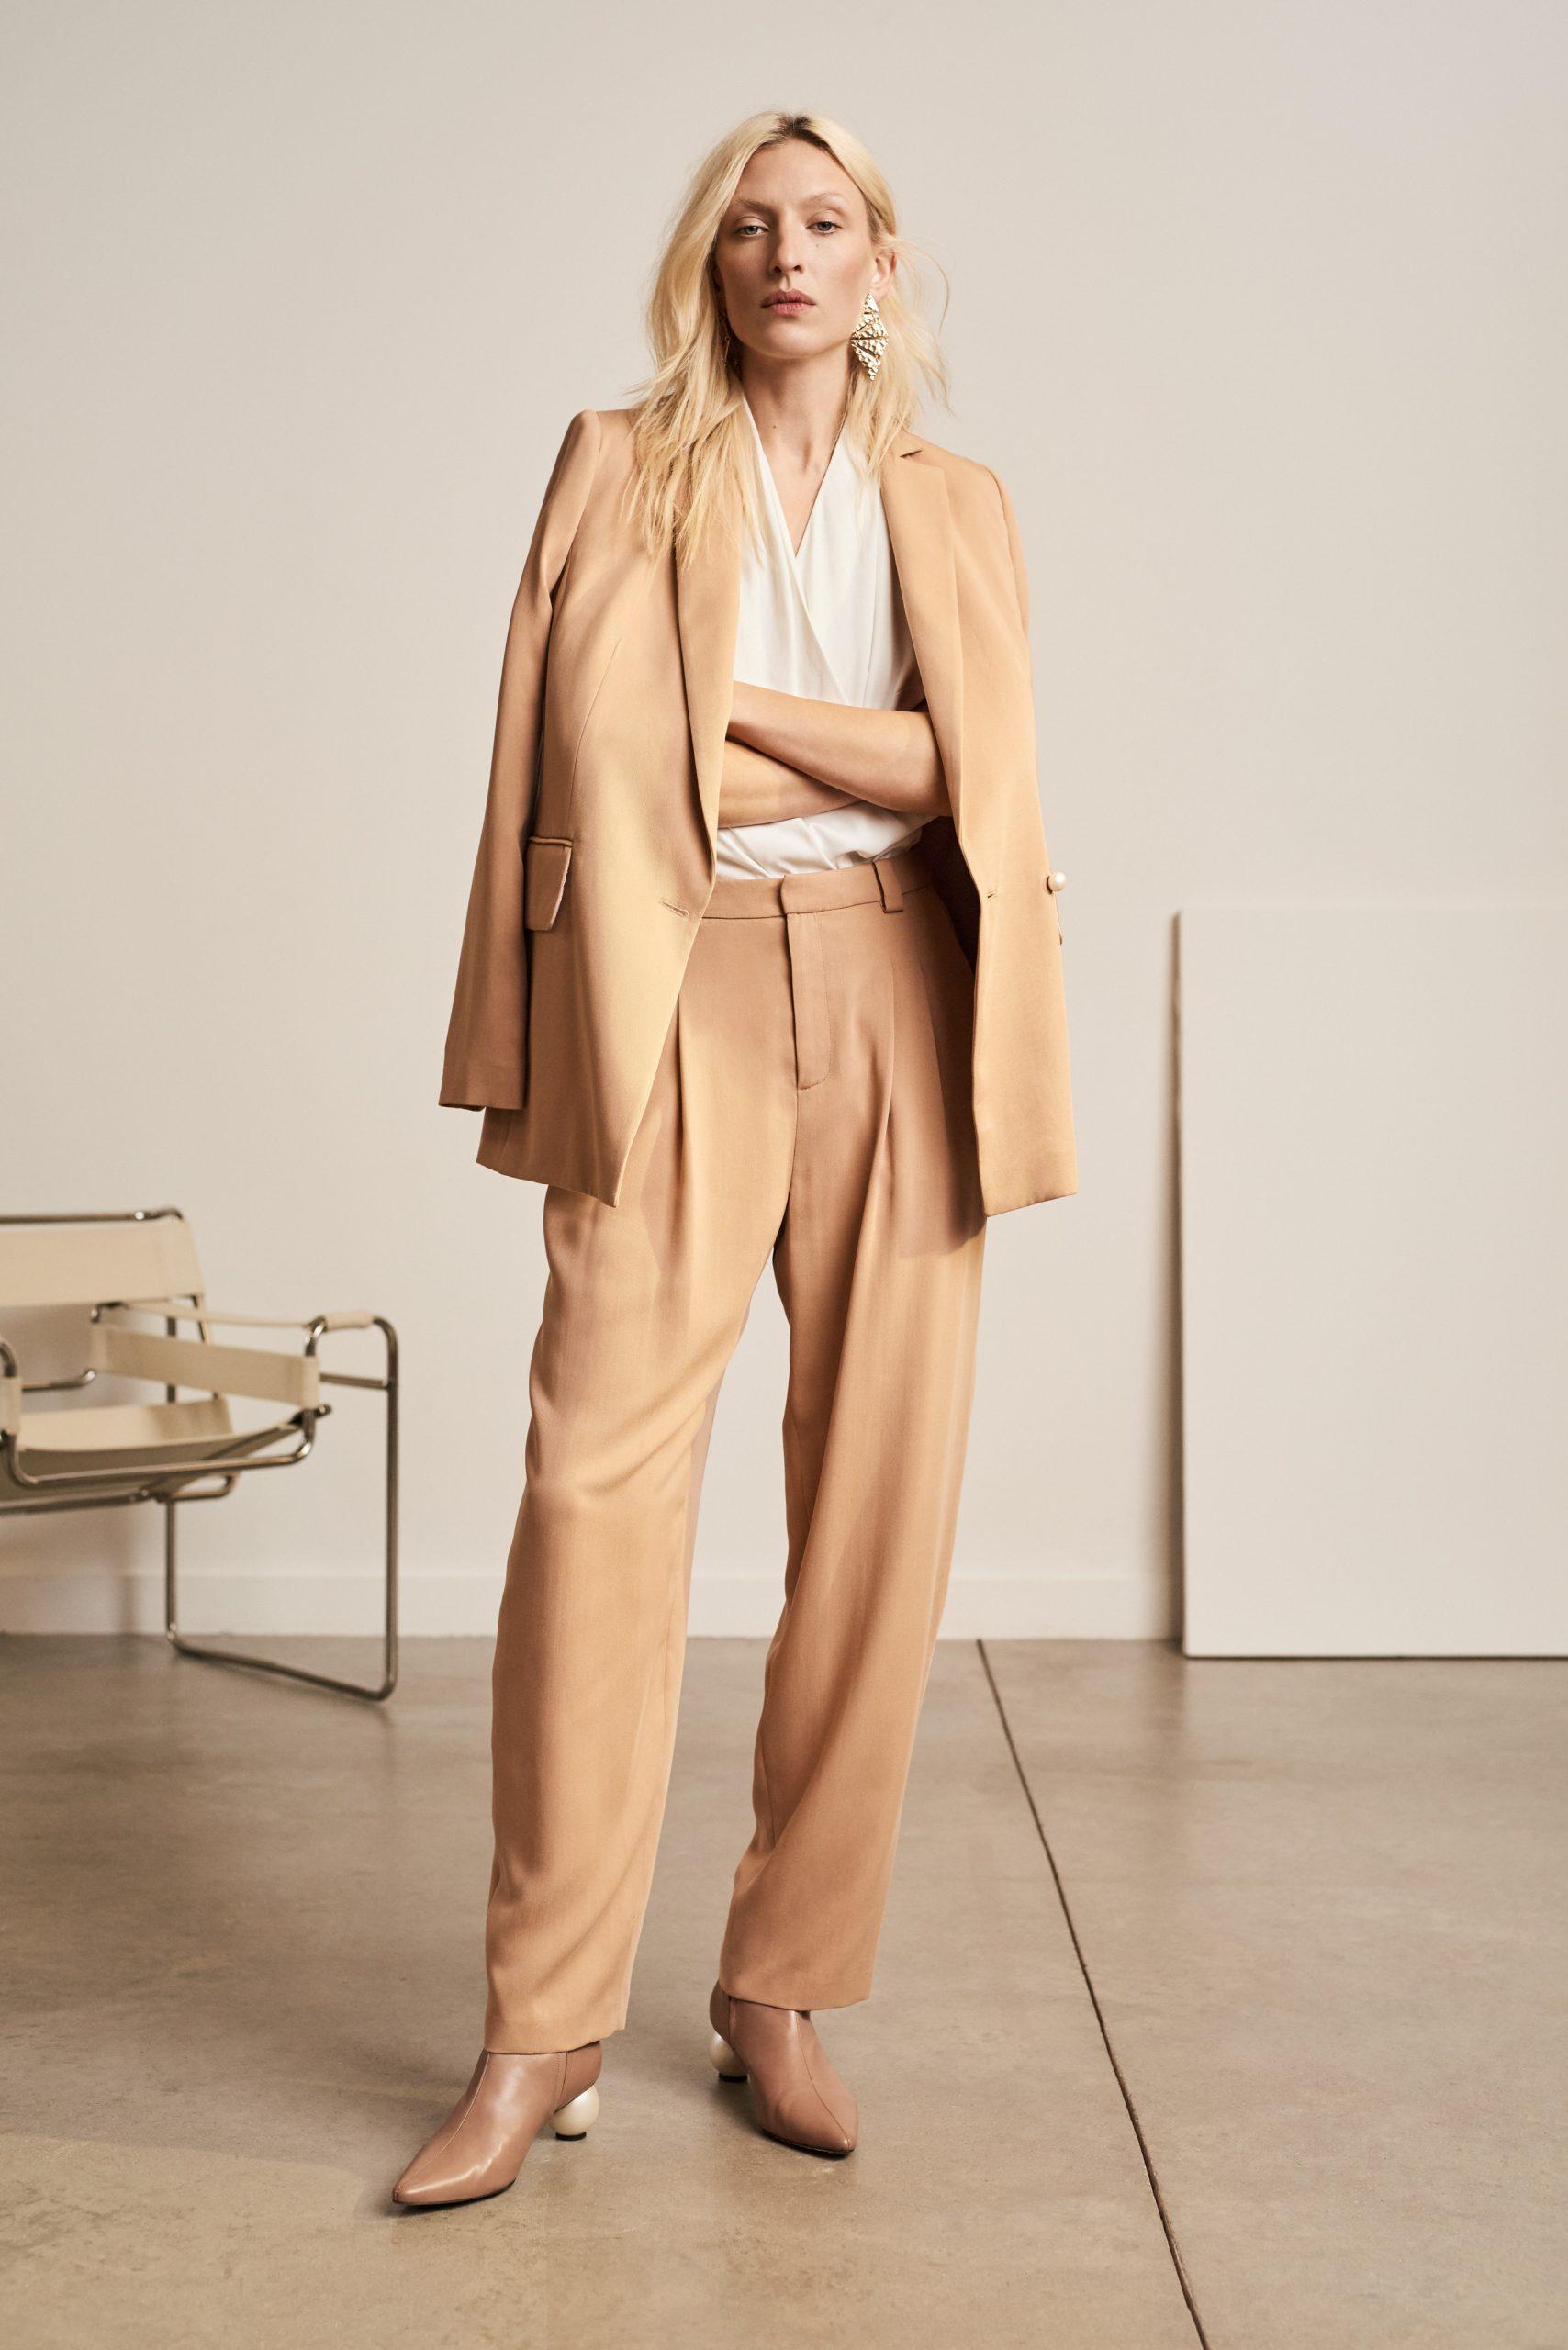 fashion designer collaborations